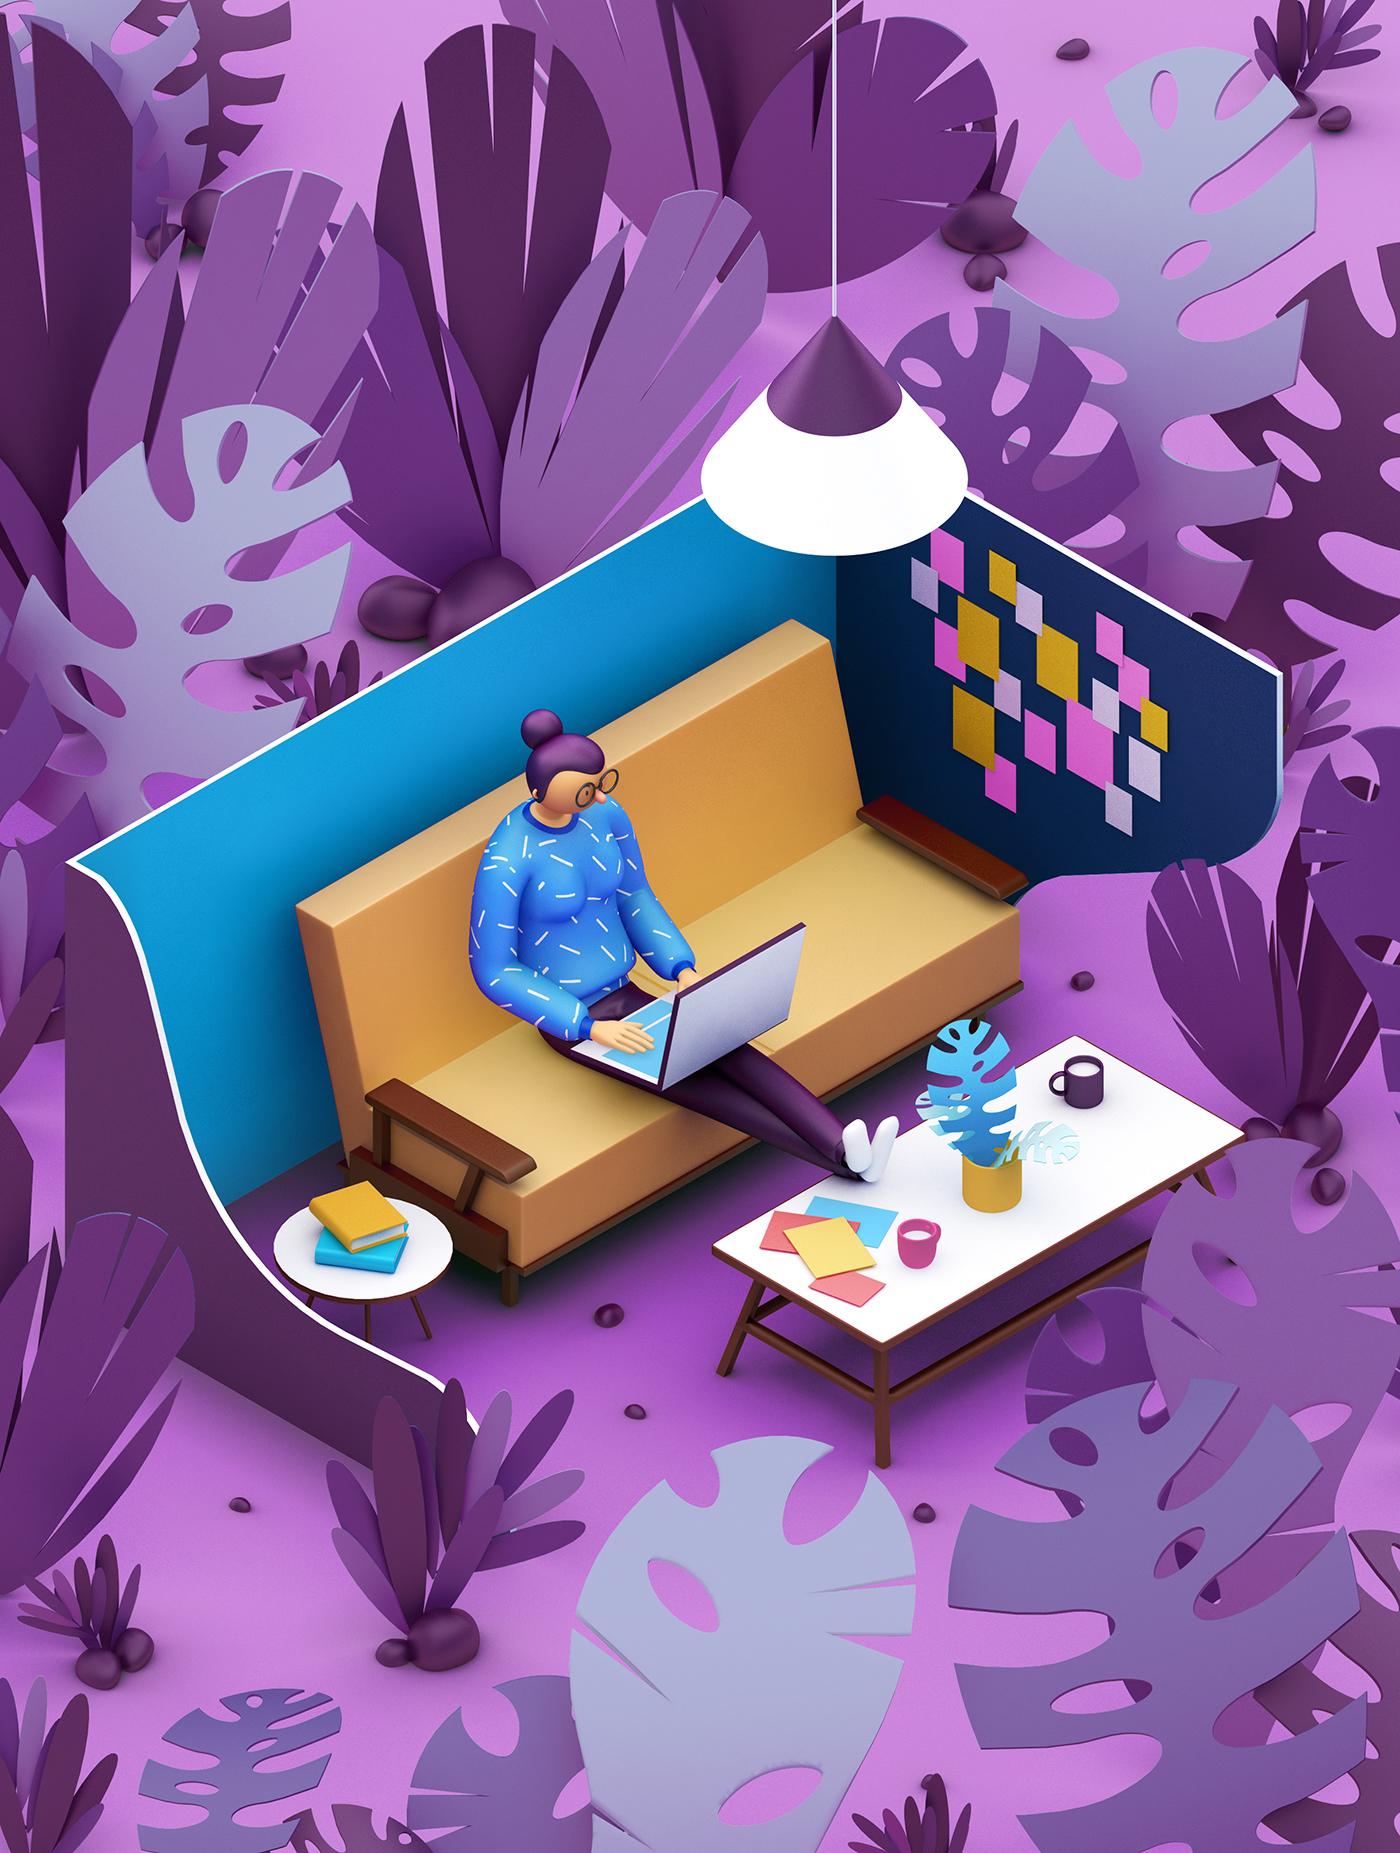 Фрилансер 3д дизайнер be a freelance programmer